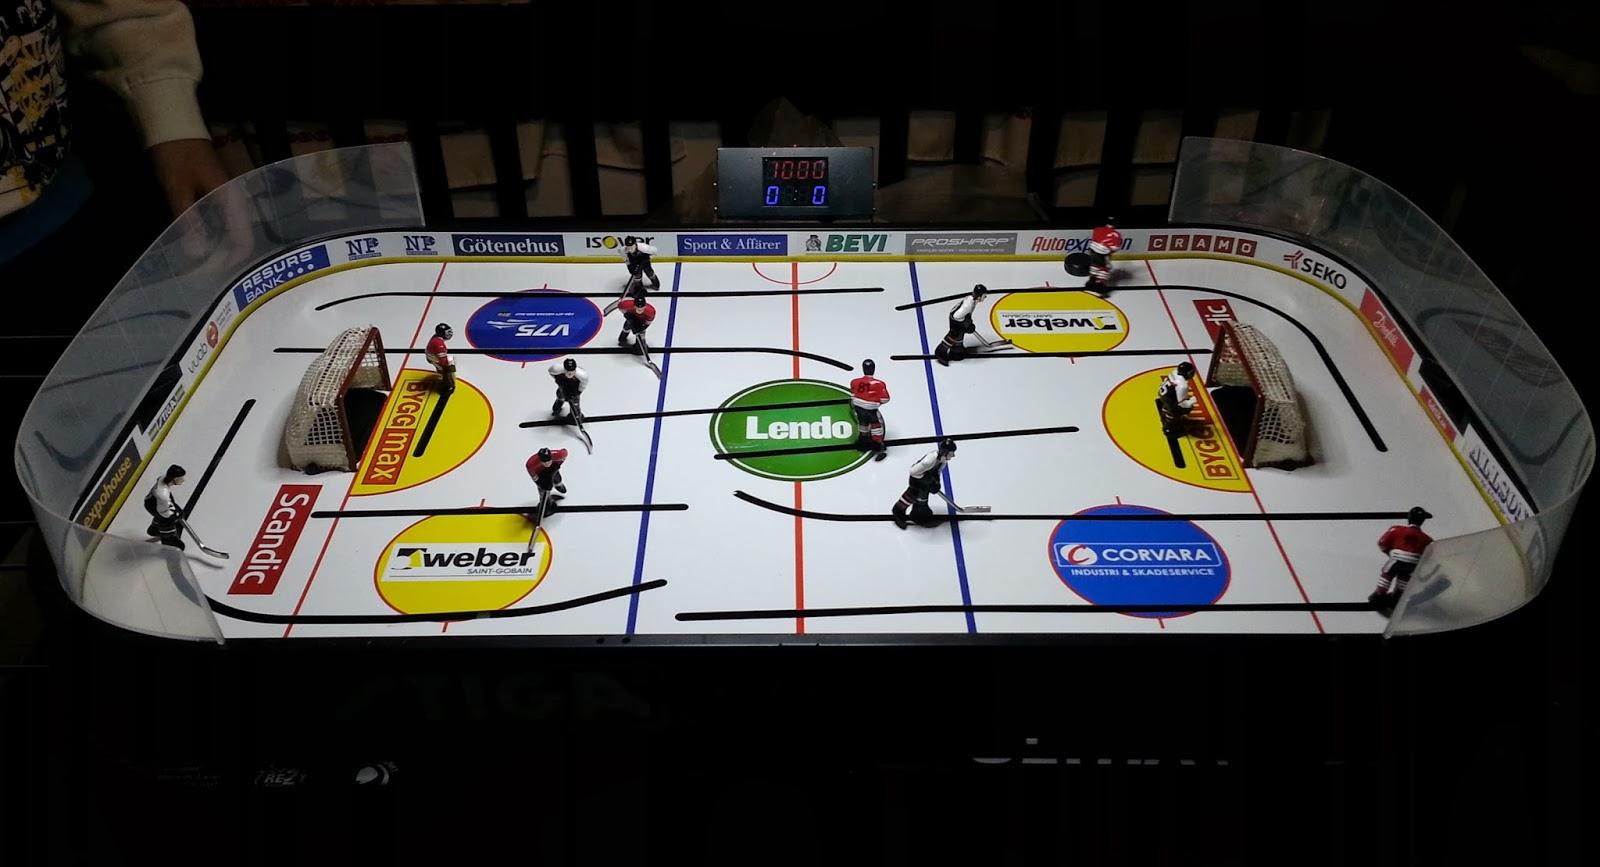 Legwinskij\'s Gadgets: STIGA table hockey custom scoreboard